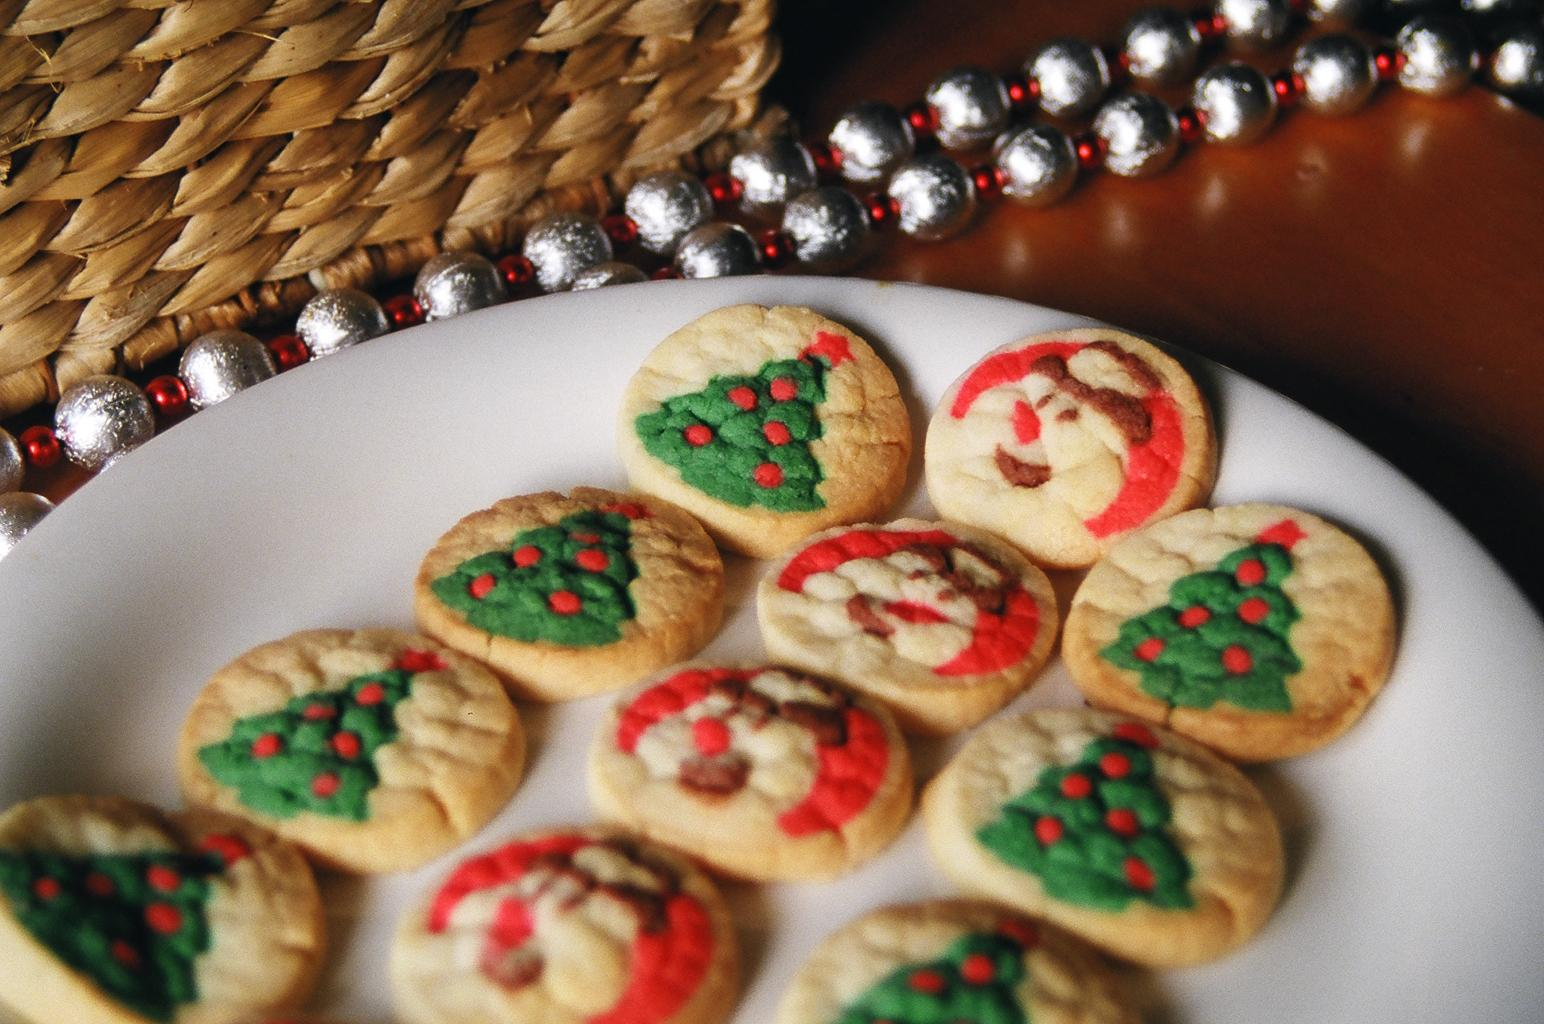 Pillsbury Christmas Cookies.Sydney Hoffman Pillsbury Christmas Cookies